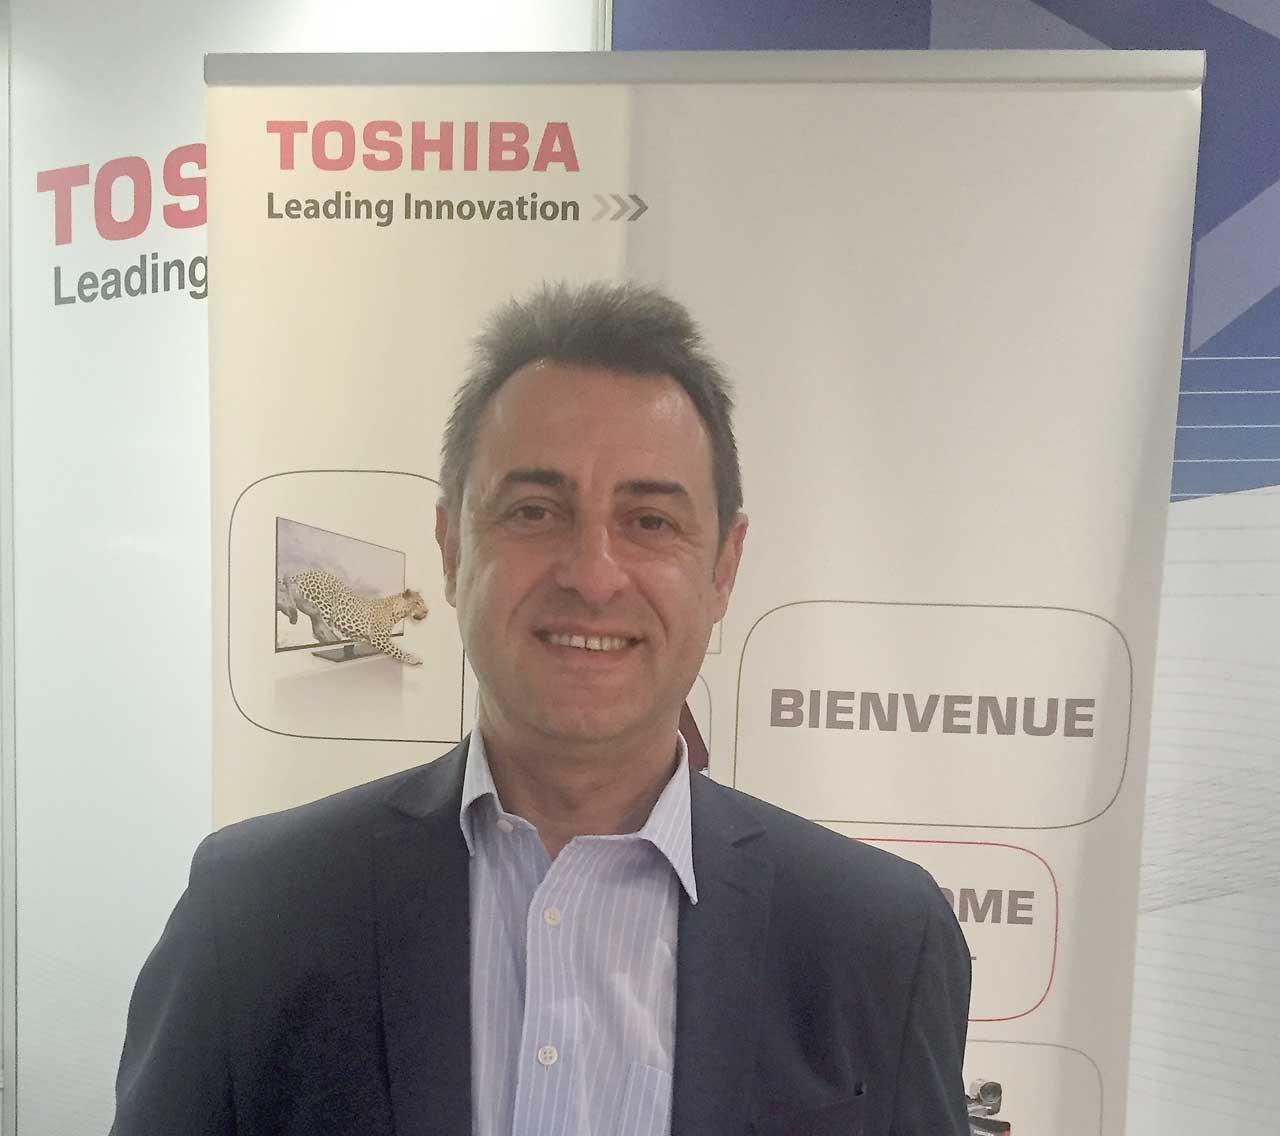 Toshiba ha nombrado a Luis Polo nuevo director comercial de su filial en España